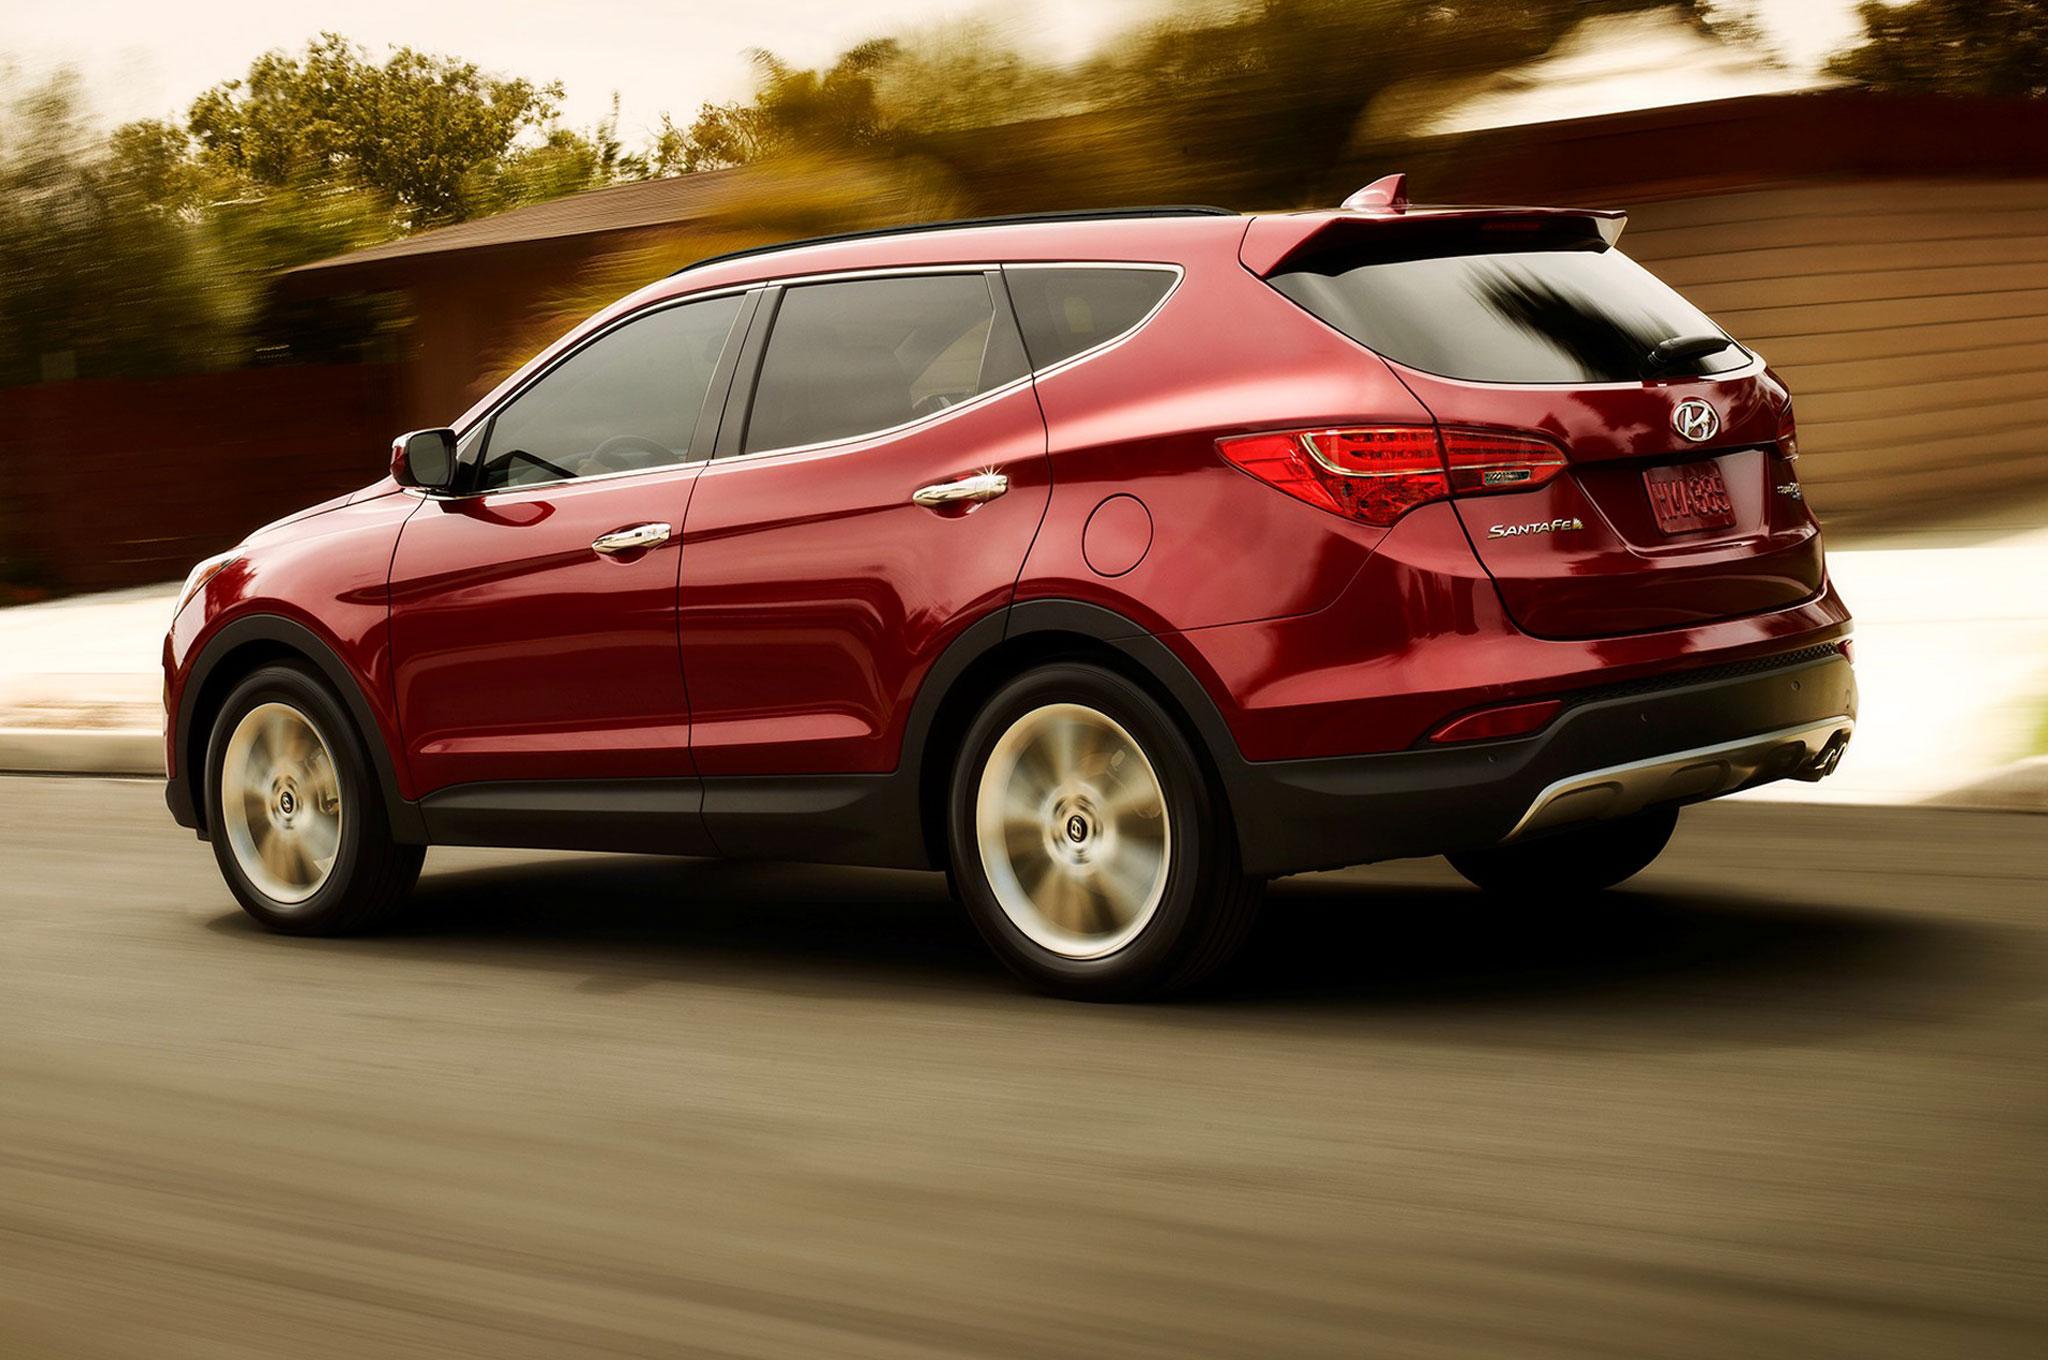 Nissan Rogue Vs Ford Escape >> Comparison - Hyundai Santa Fe Sport 2015 - vs - Toyota RAV4 SUV 2015 | SUV Drive